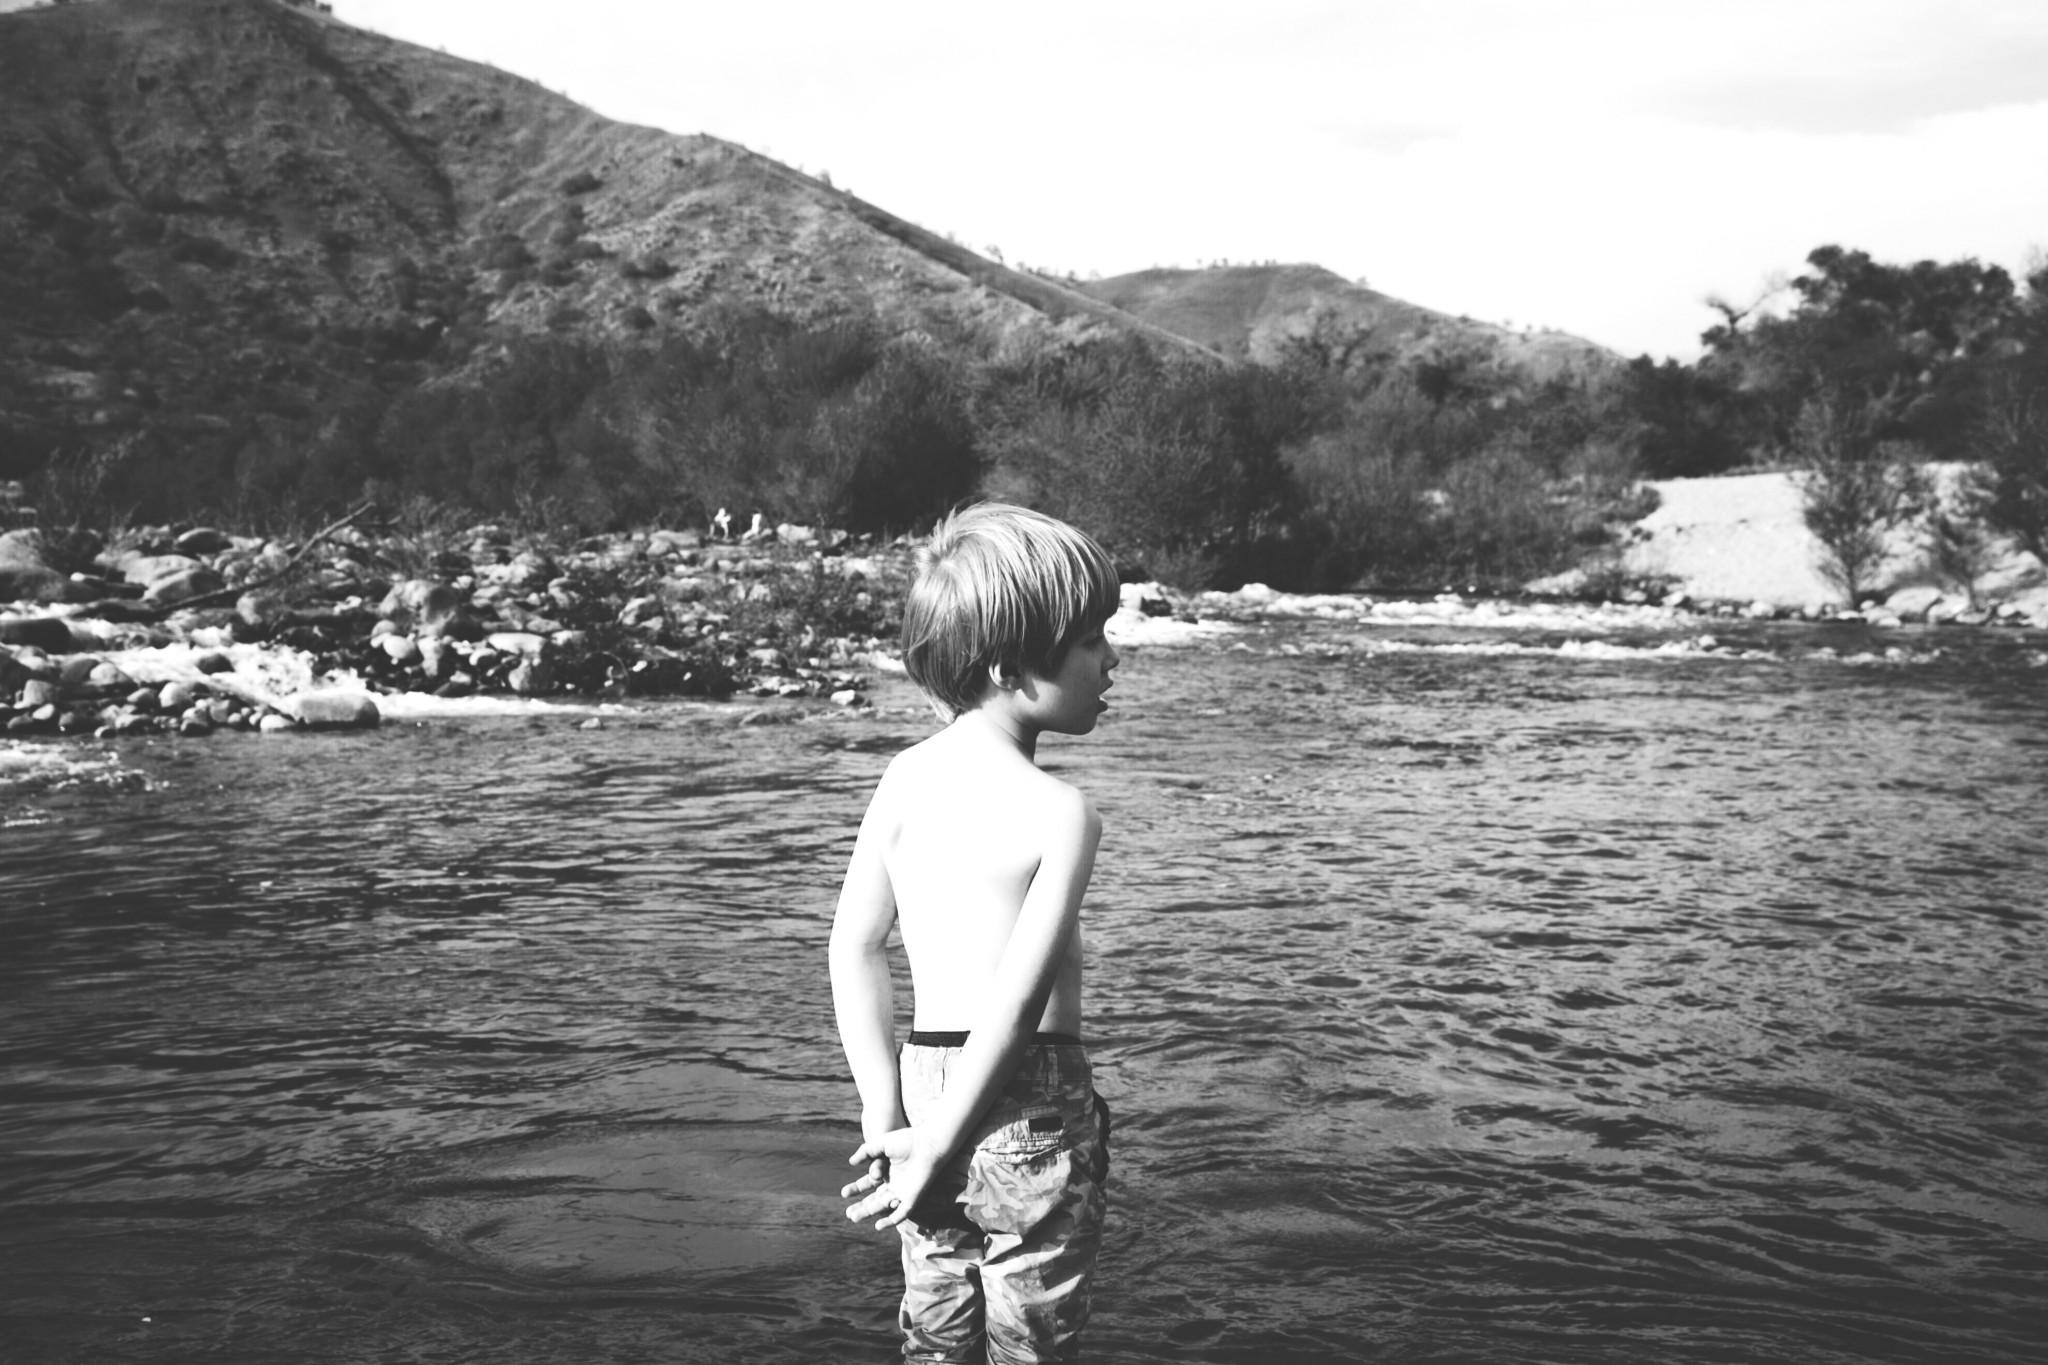 17/52 Madelon. 52 project. Each kid. One photo. Every week.